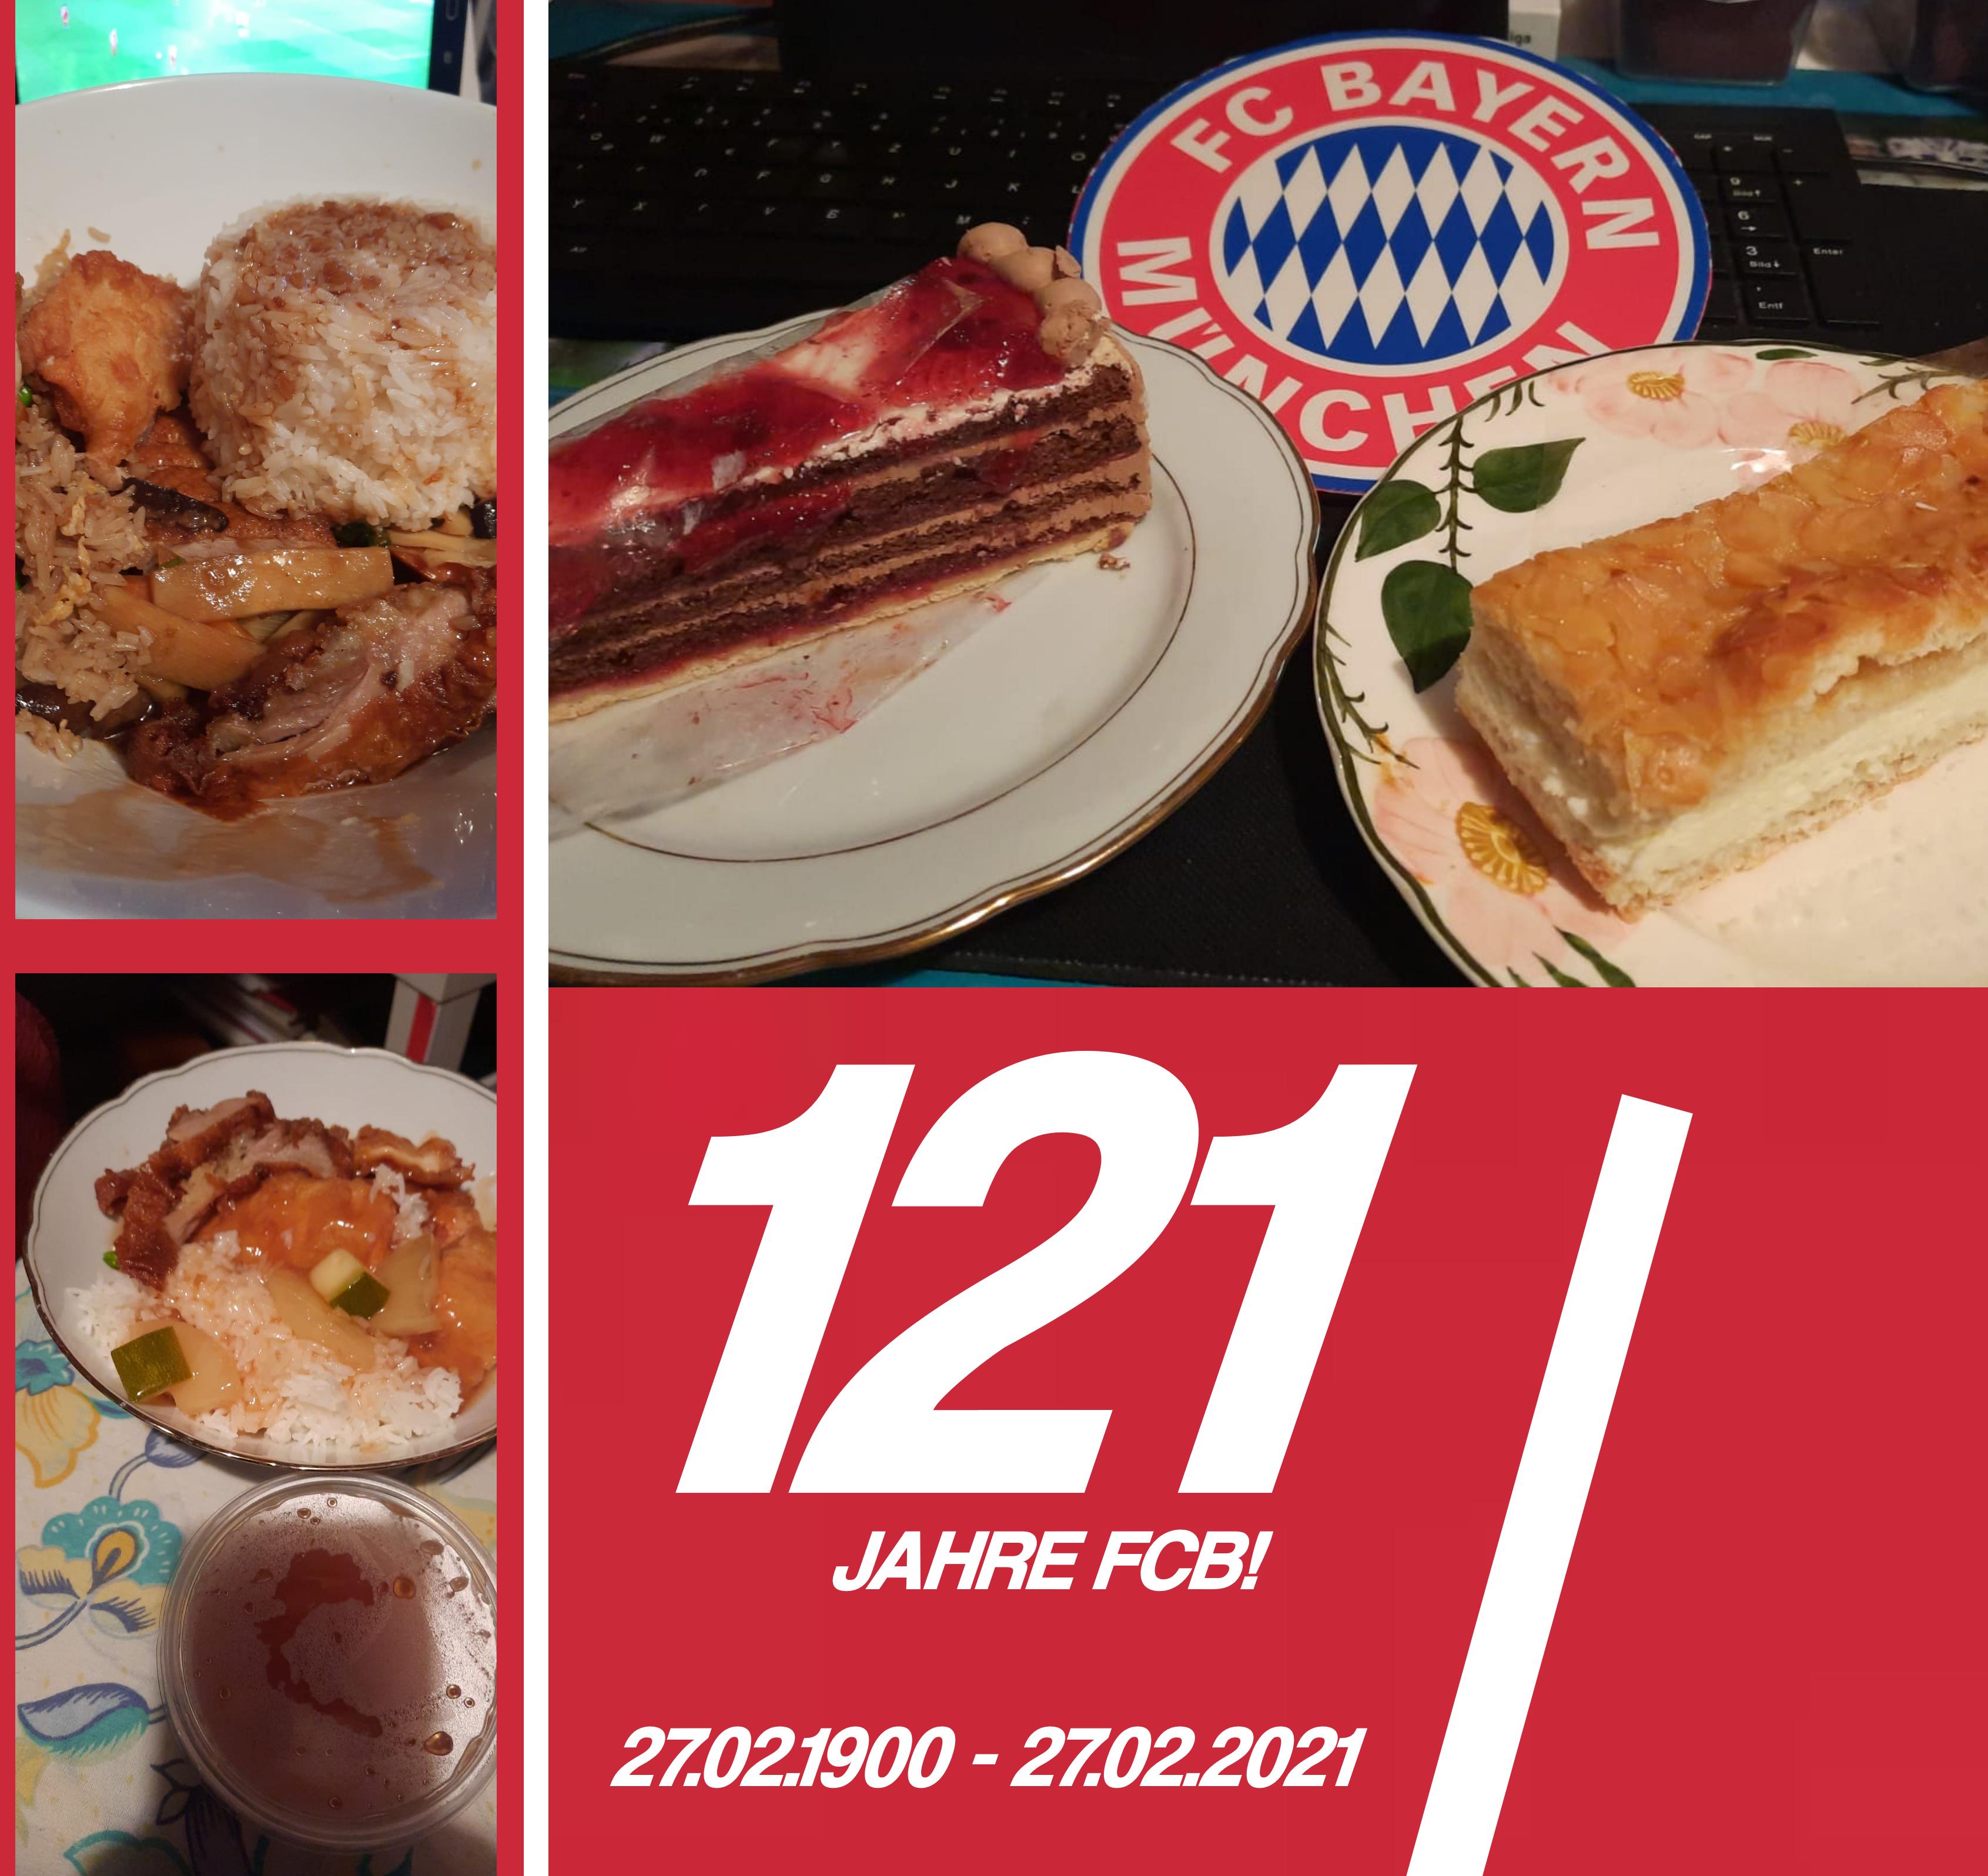 HAPPY BIRTHDAY lieber FCB! <3